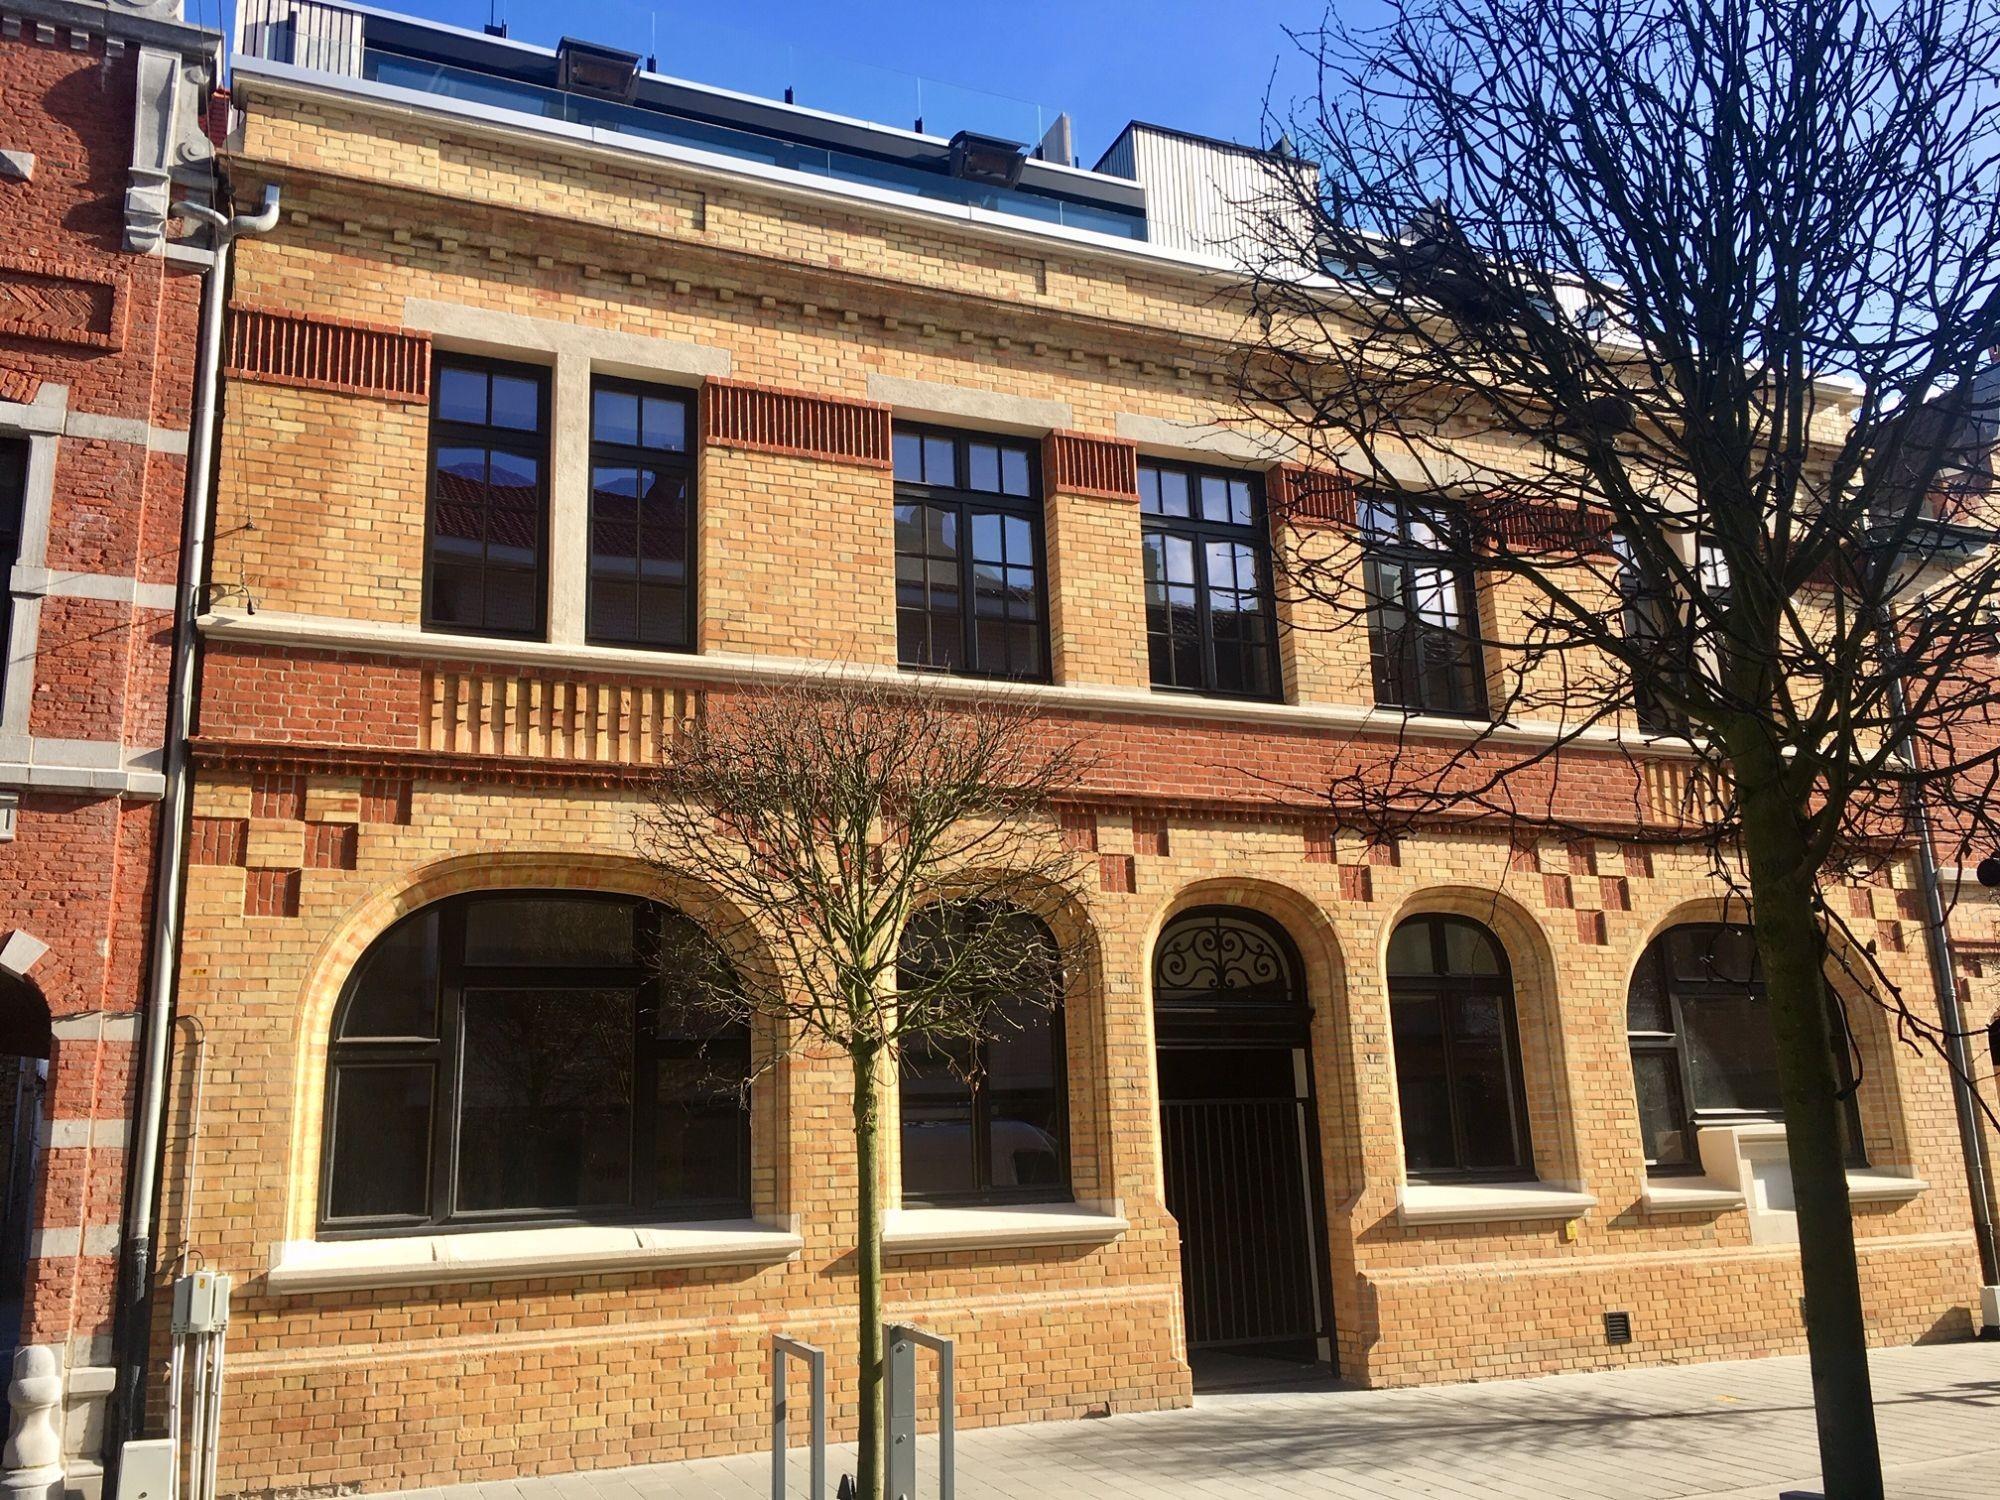 Nieuwpoort - Huis / Maison - Sea Pleasure - Loft De Oude Po